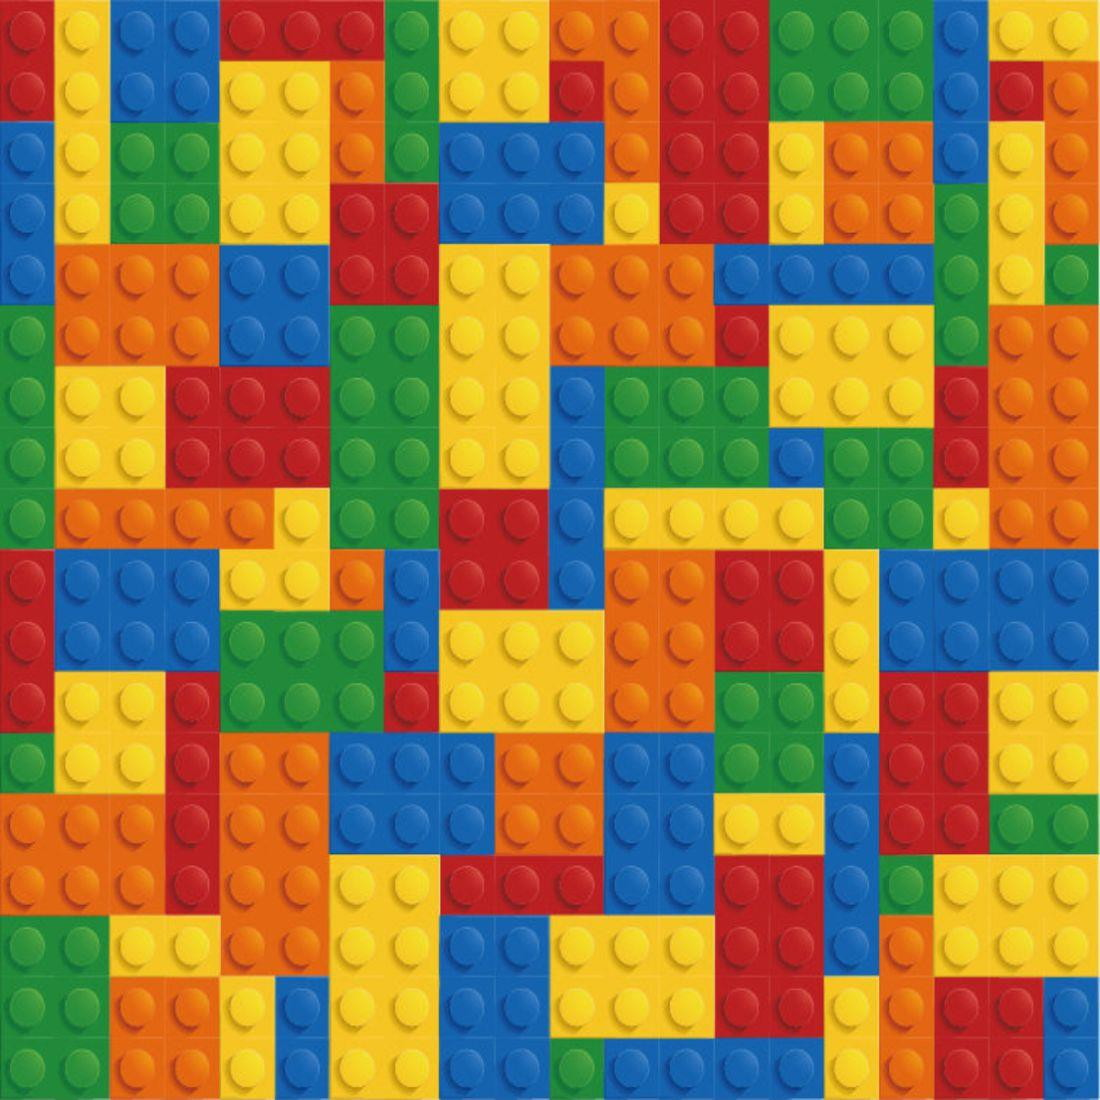 Papel de parede lego decor no elo7 crie decore 597f95 - Papel para paredes baratos ...